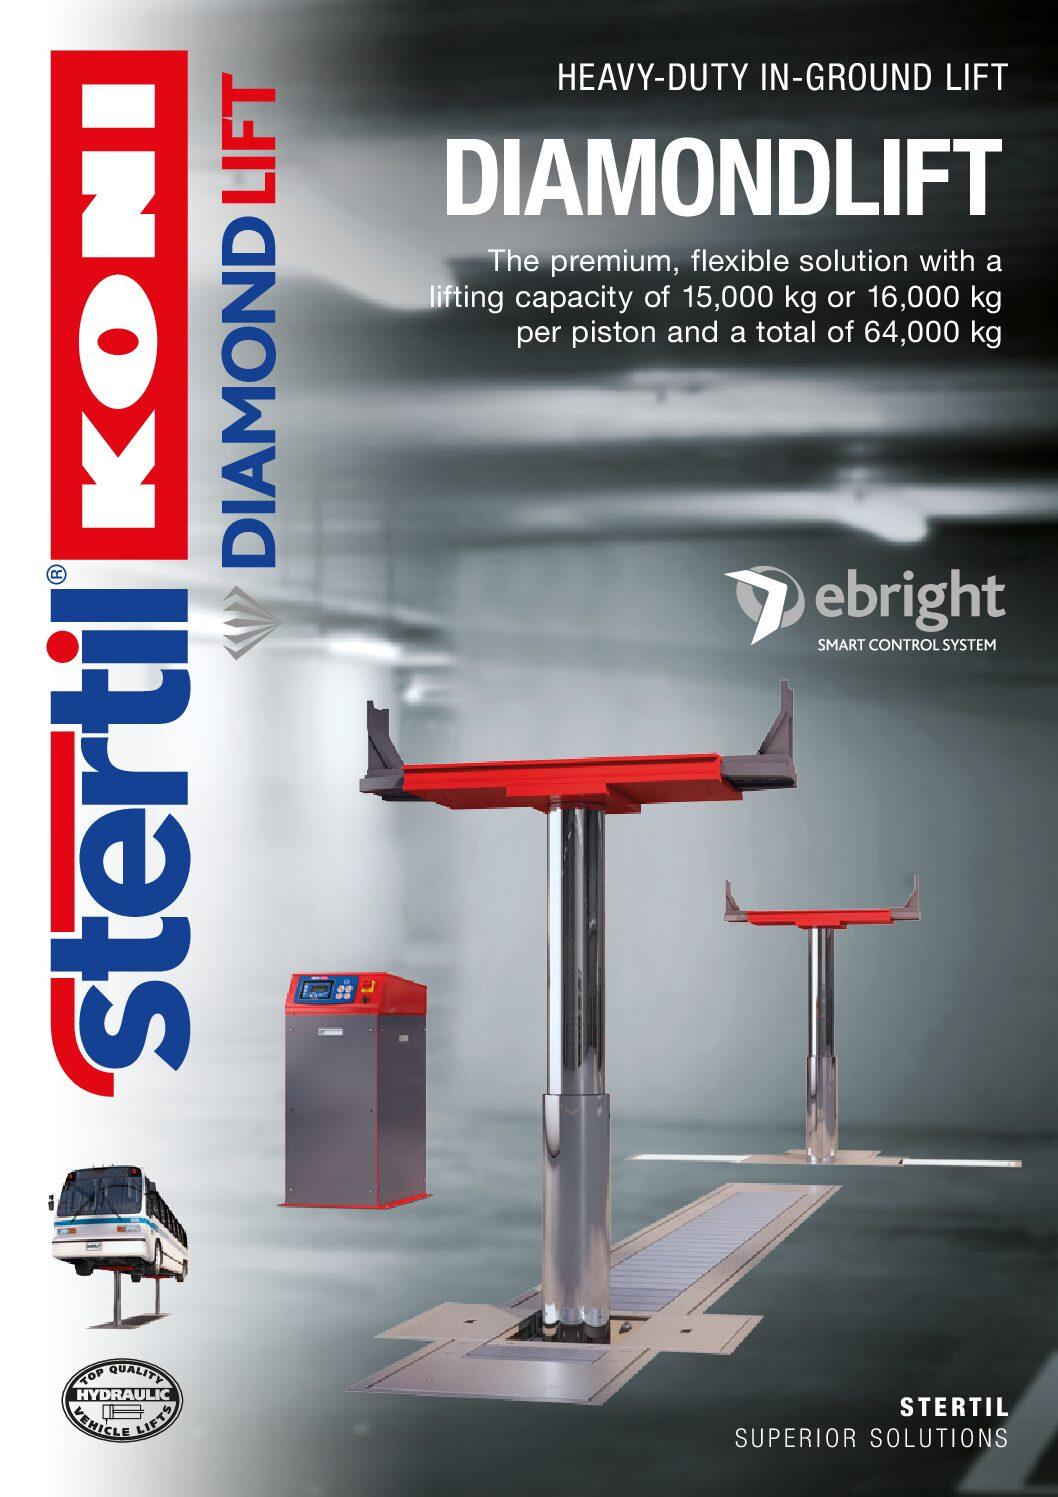 Stertil-Koni: DIAMONDLIFT – GB Version